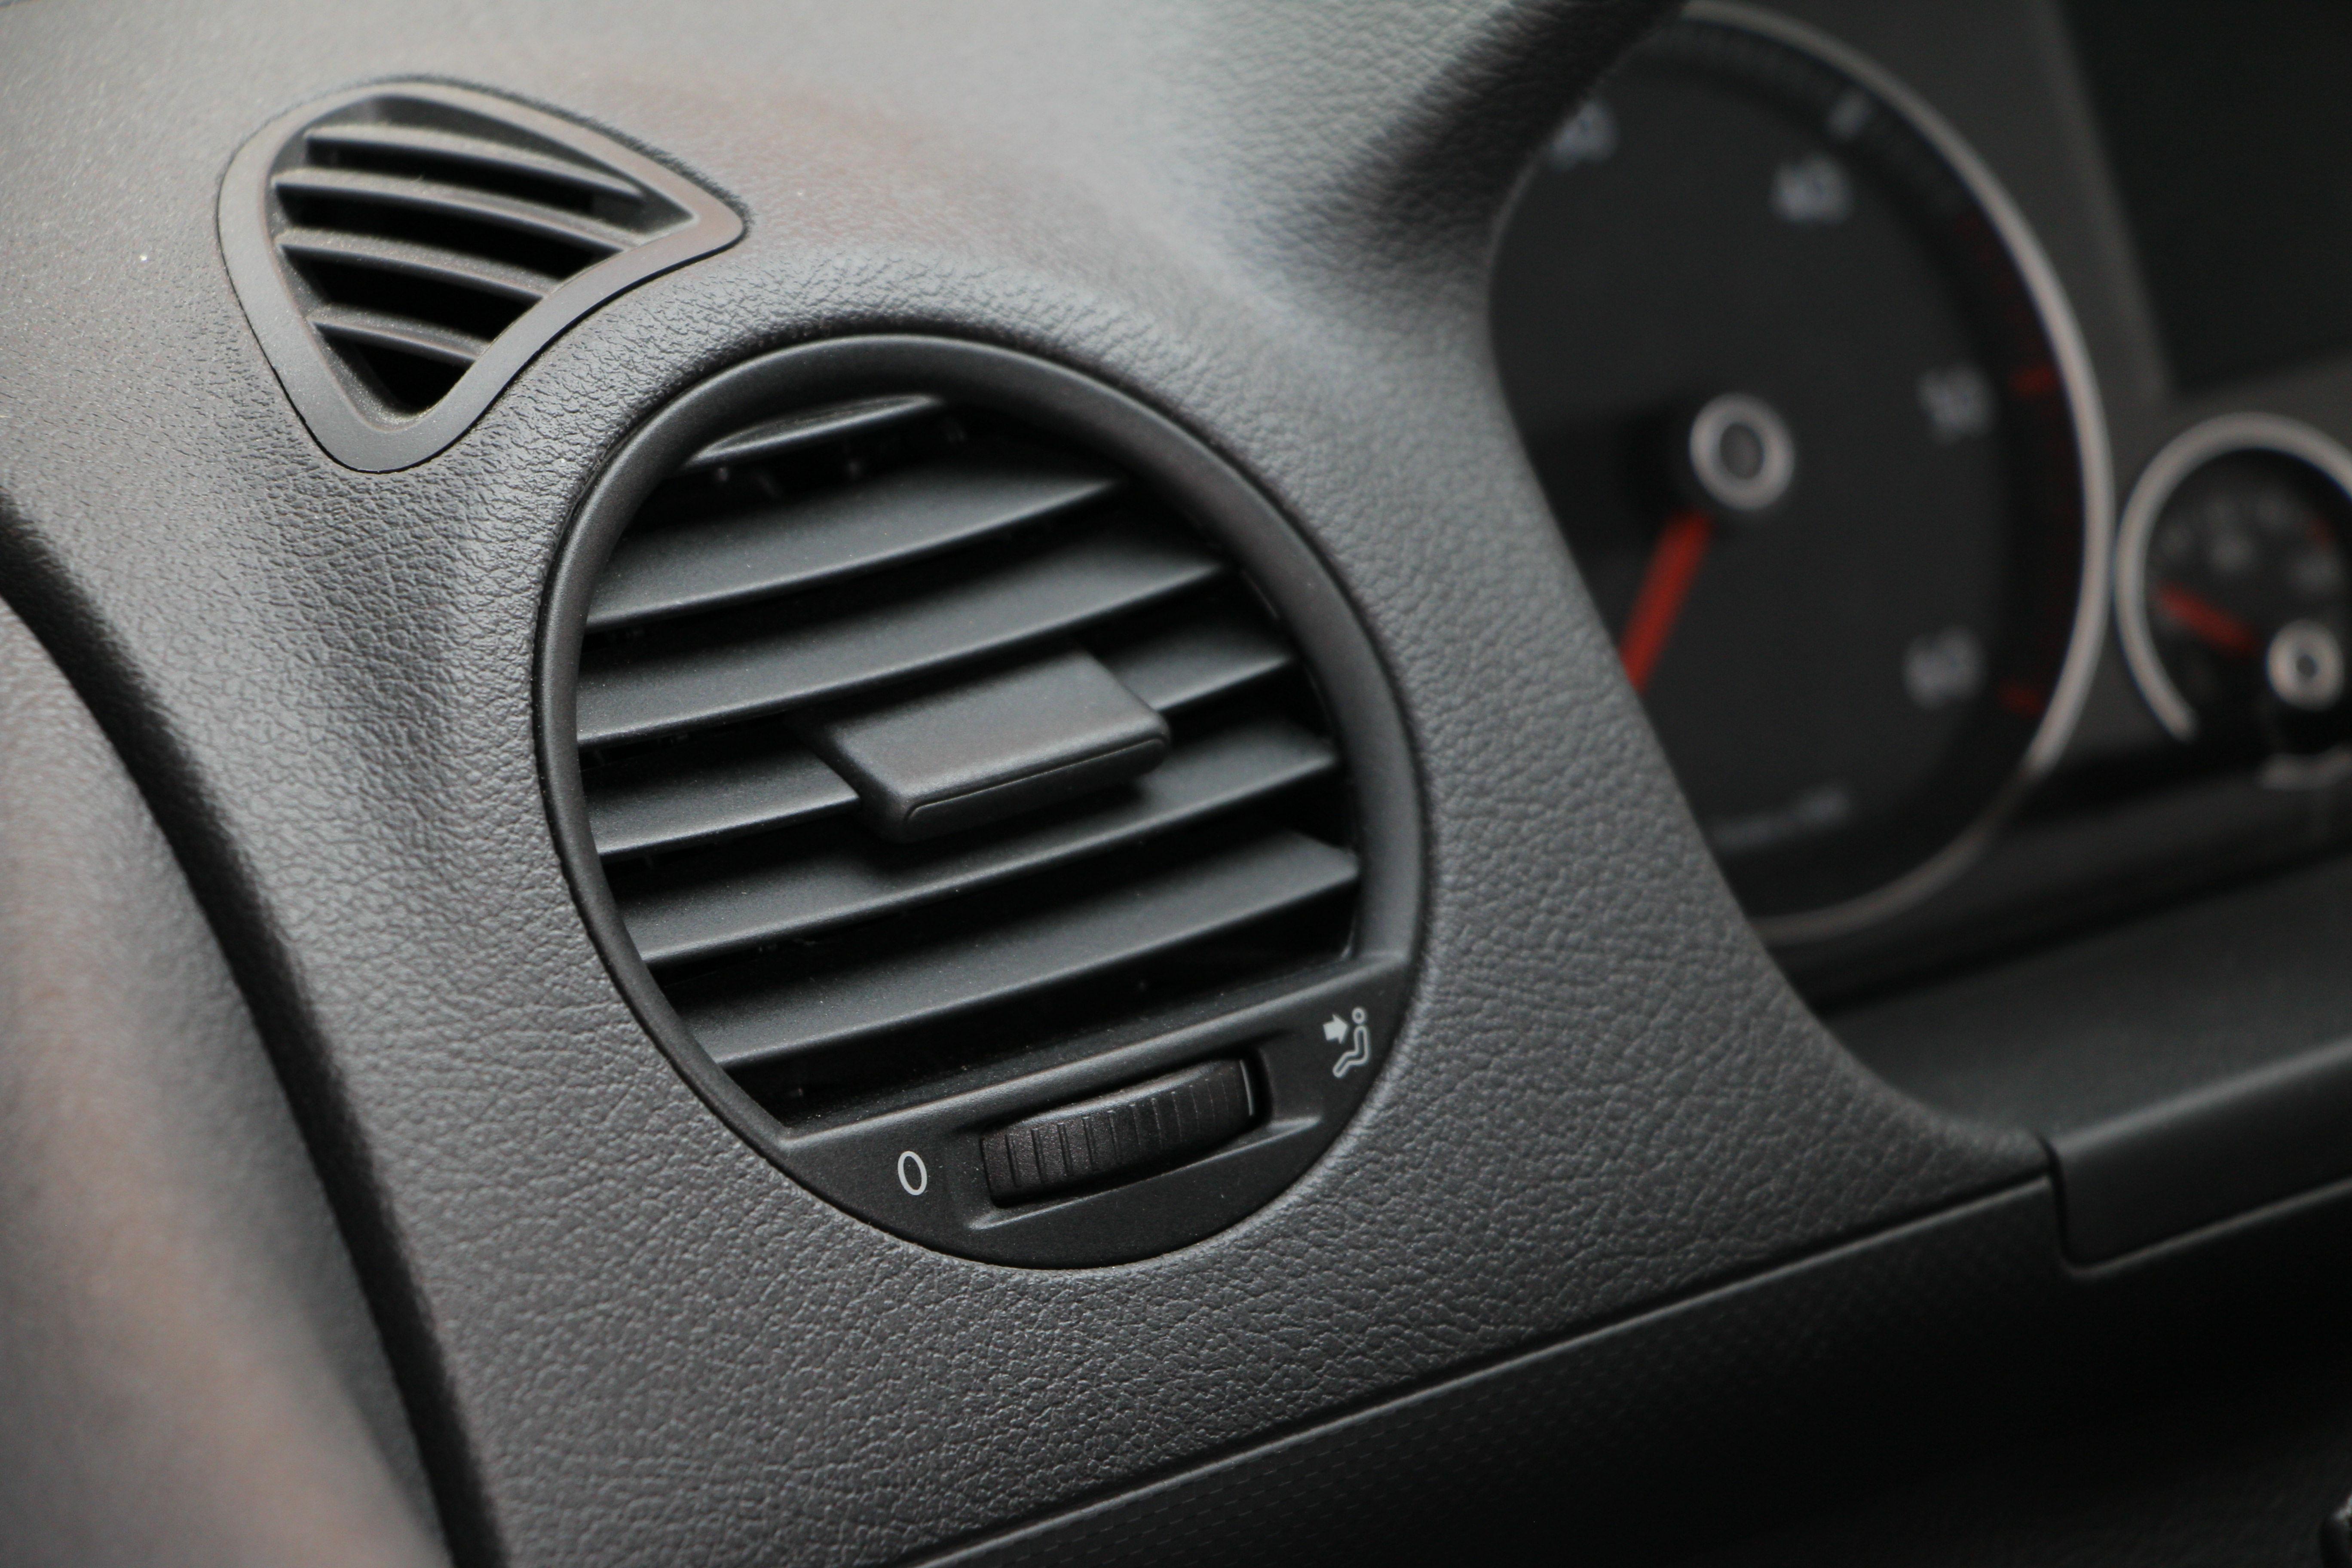 images plastic interior volkswagen auto dashboard sedan pkw city car sport